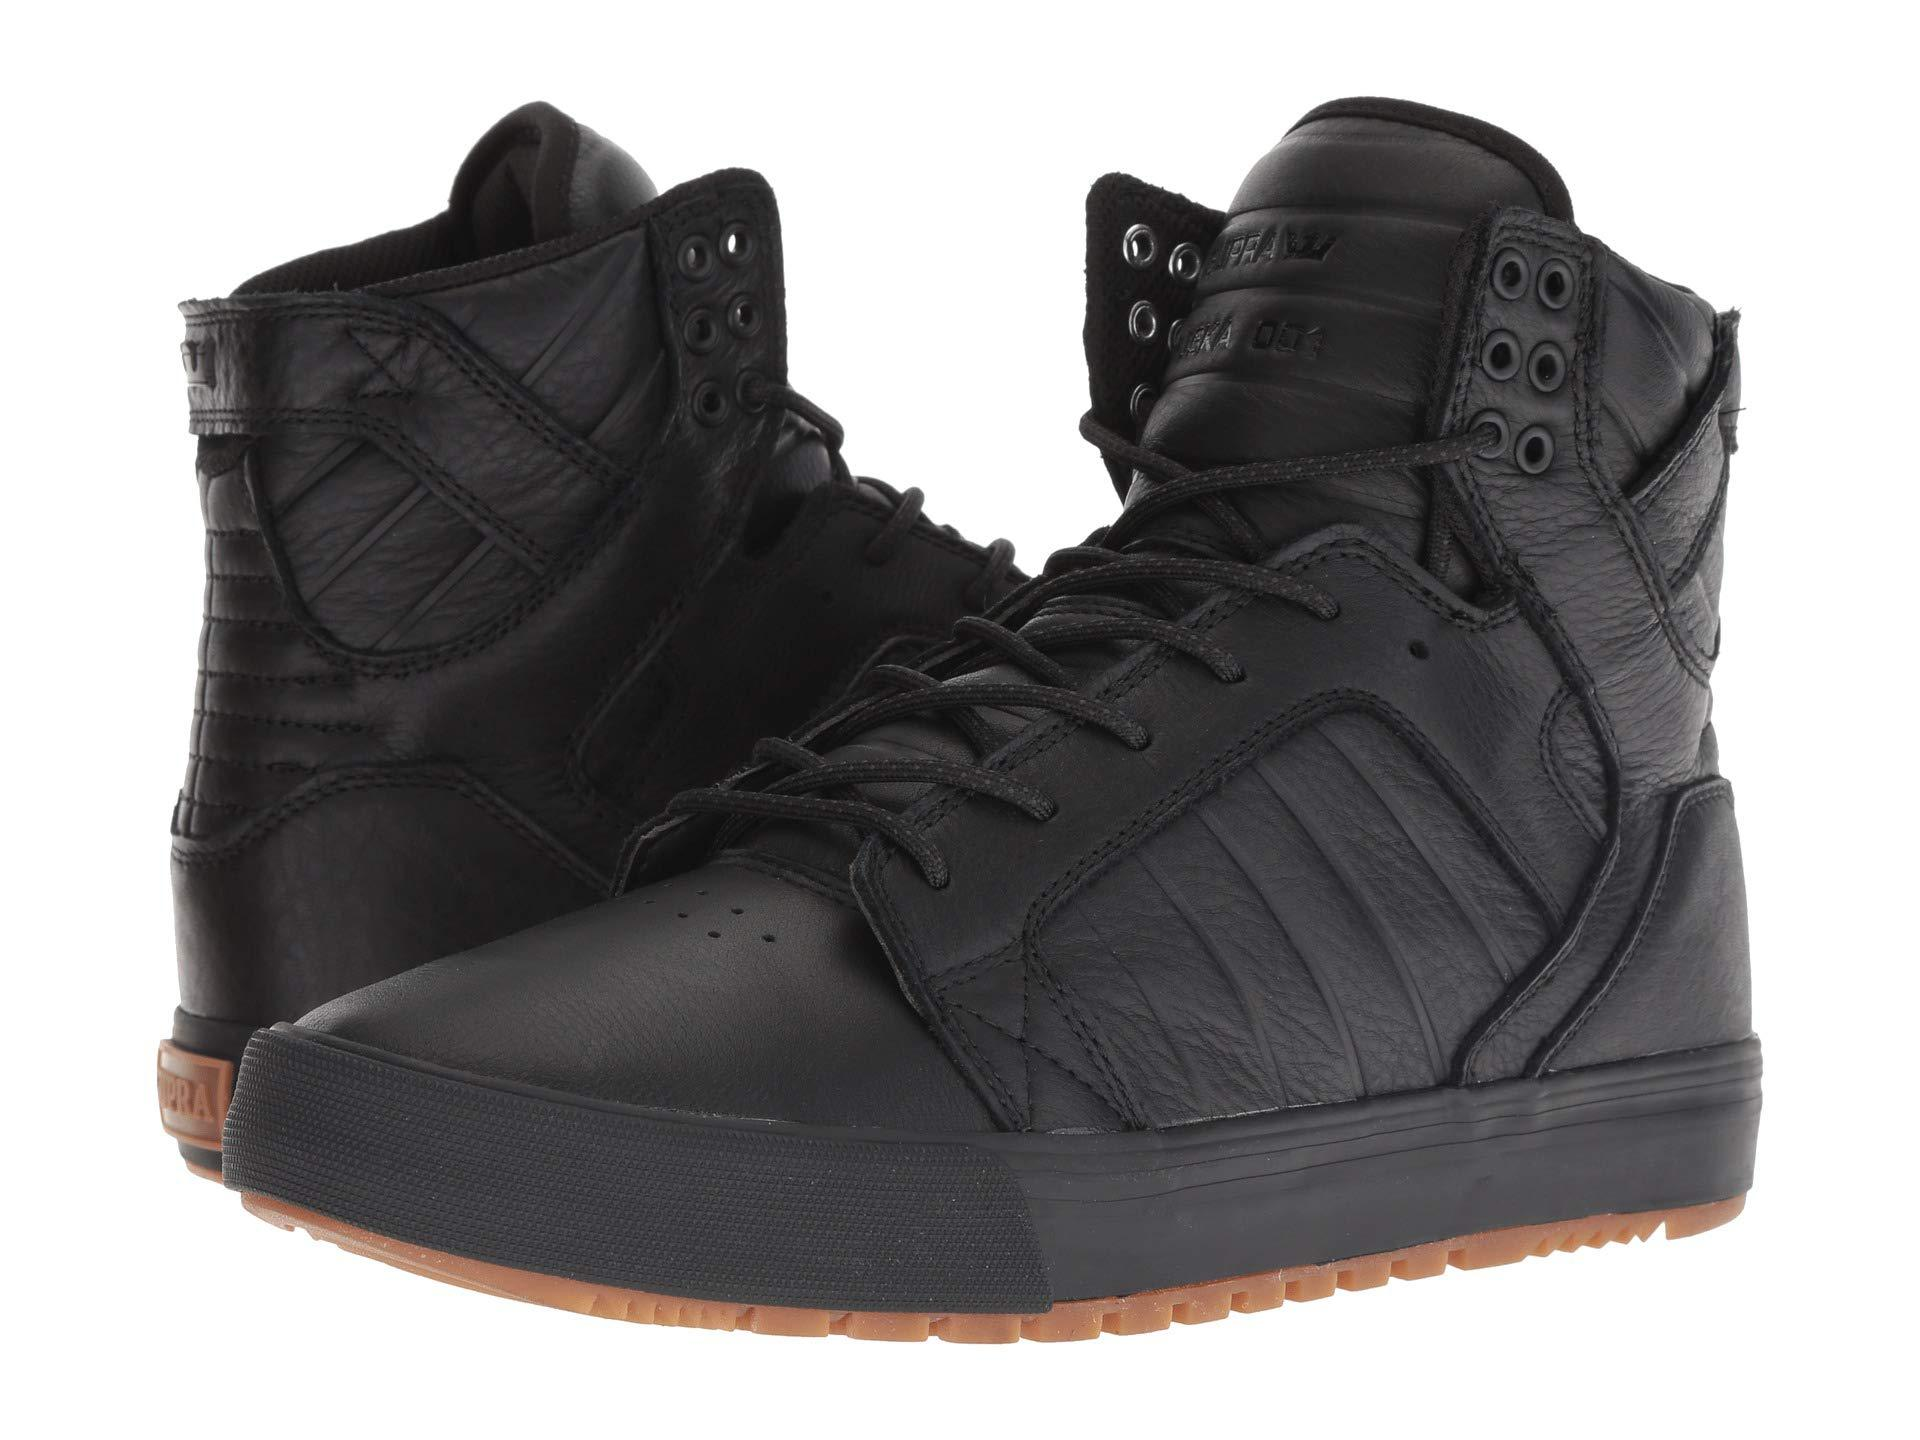 8354ff23877 Lyst - Supra Skytop Cw Winter (black black gum) Men s Shoes in Black ...